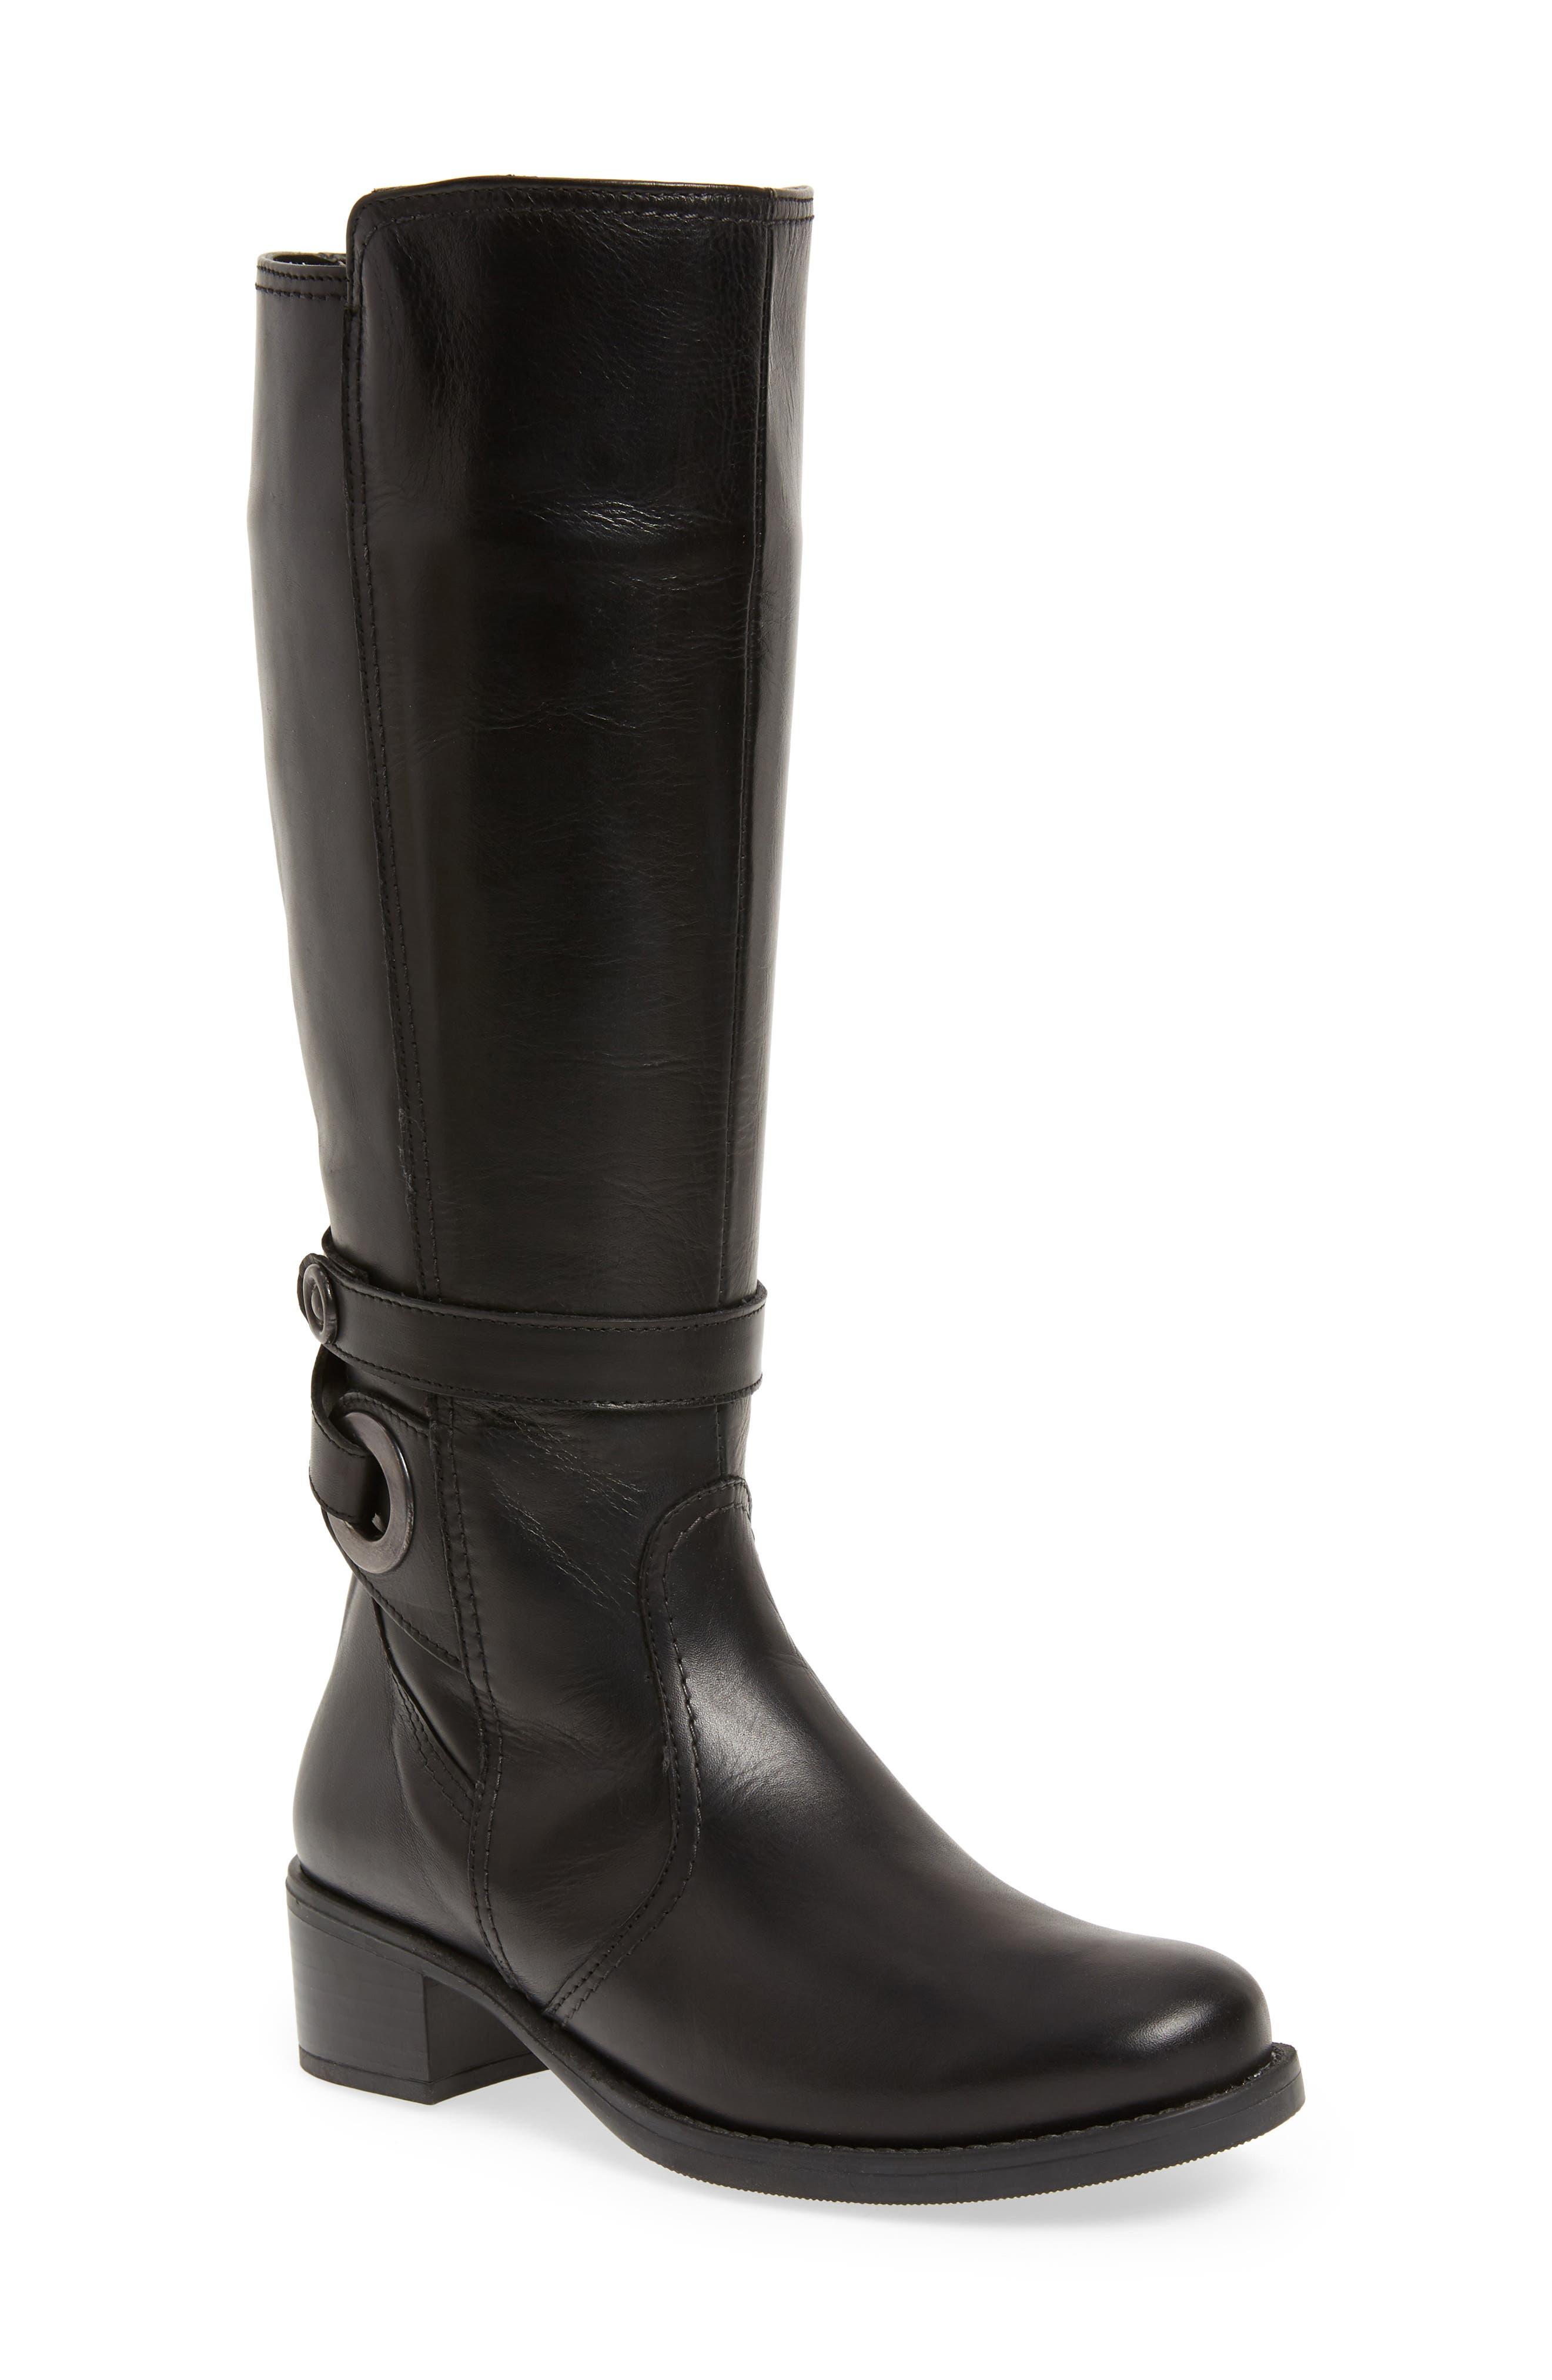 David Tate Portofino Boot, Black